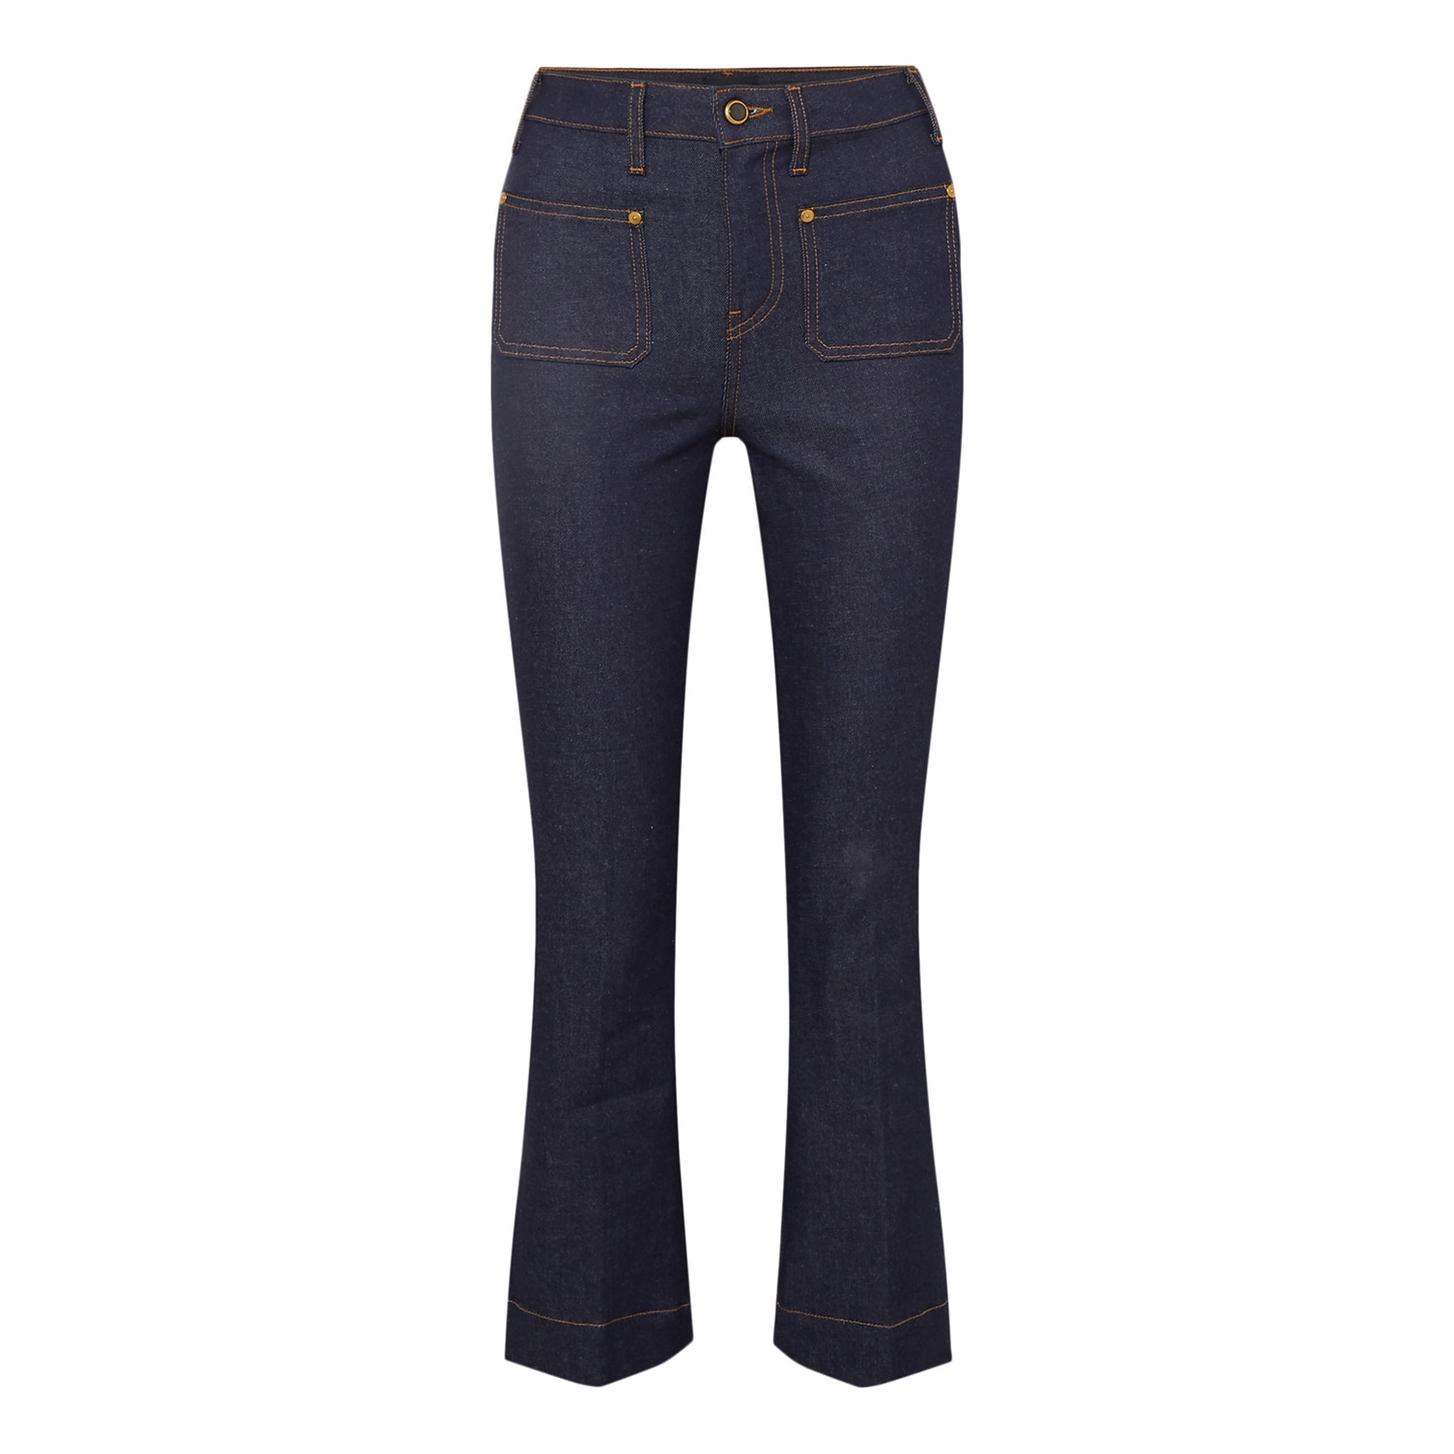 Khaite Raquel Cropped Flared Jeans